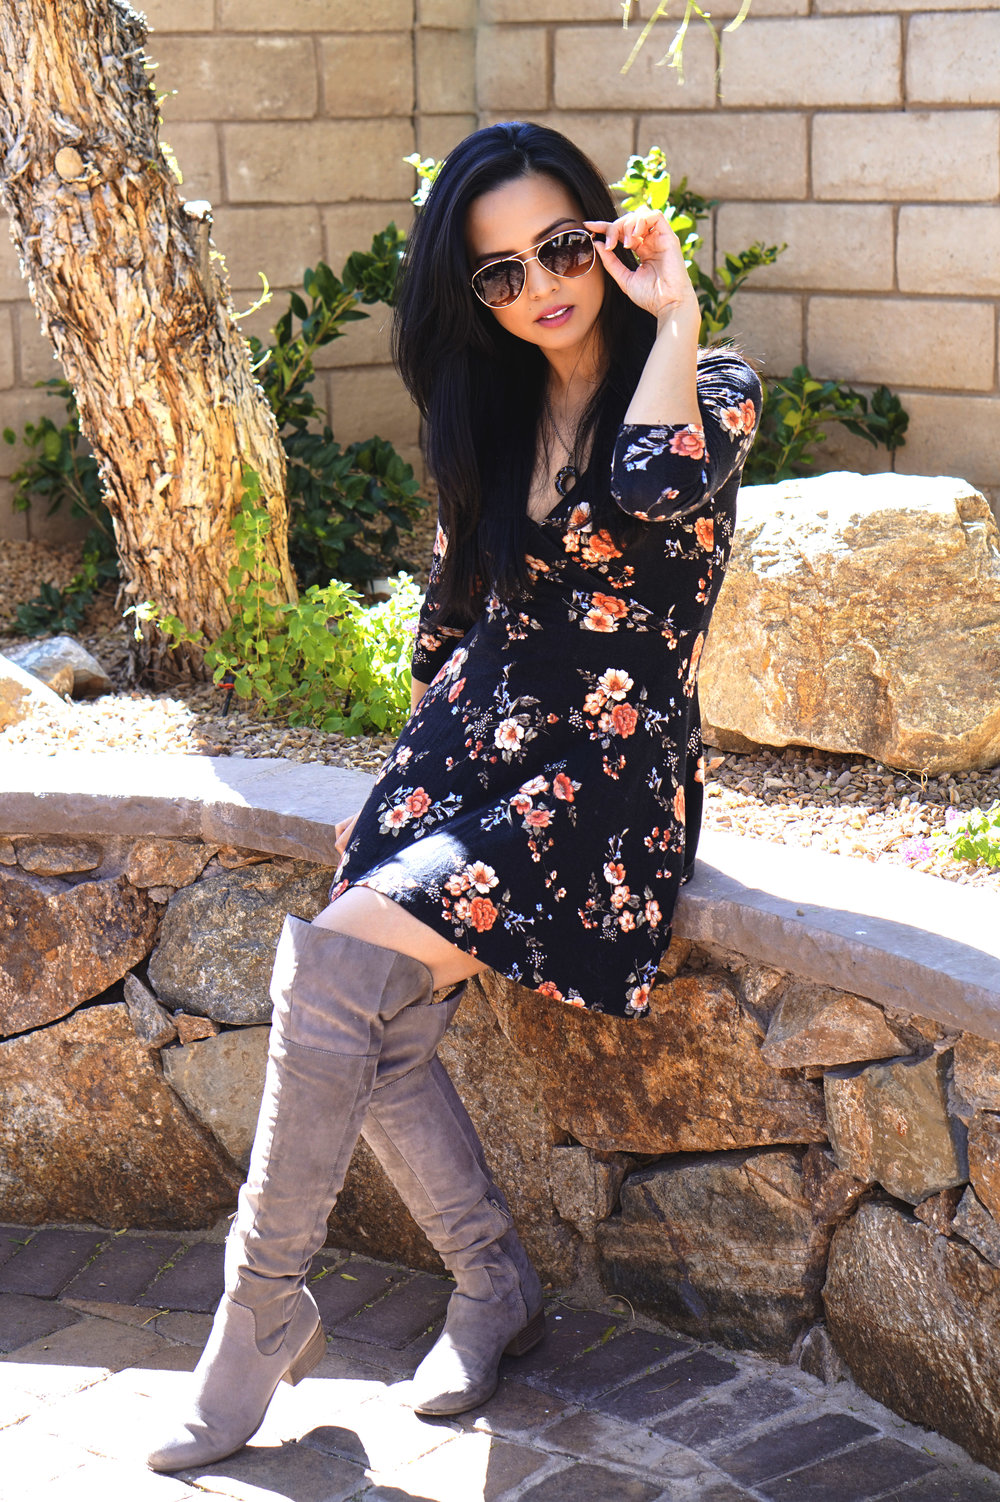 Boots:  Charlotte Russe  Sunglasses:  Francesca's